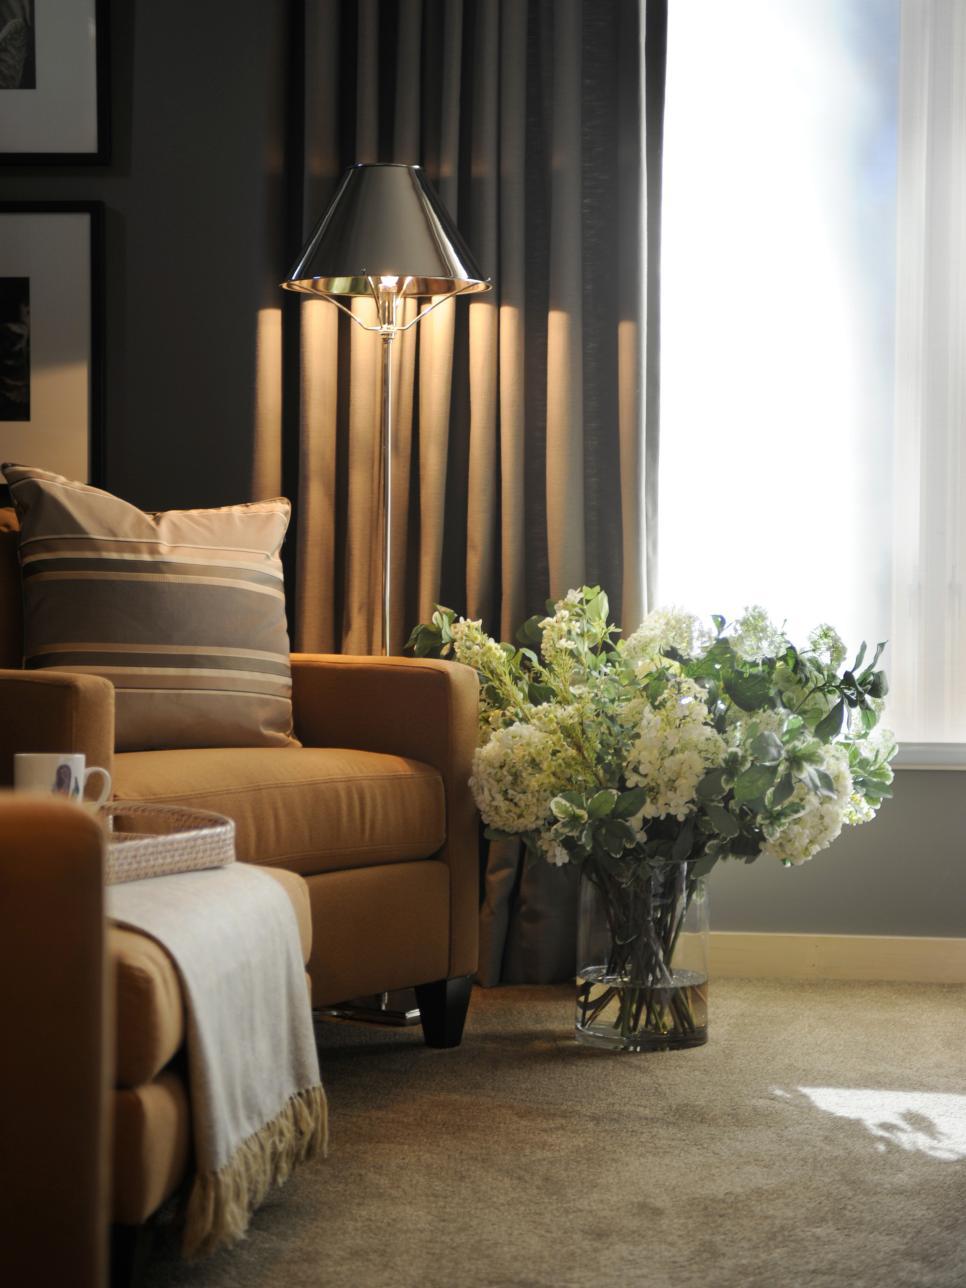 Hotel Guest Room Design: HGTV Dream Home 2011 Guest Bedroom